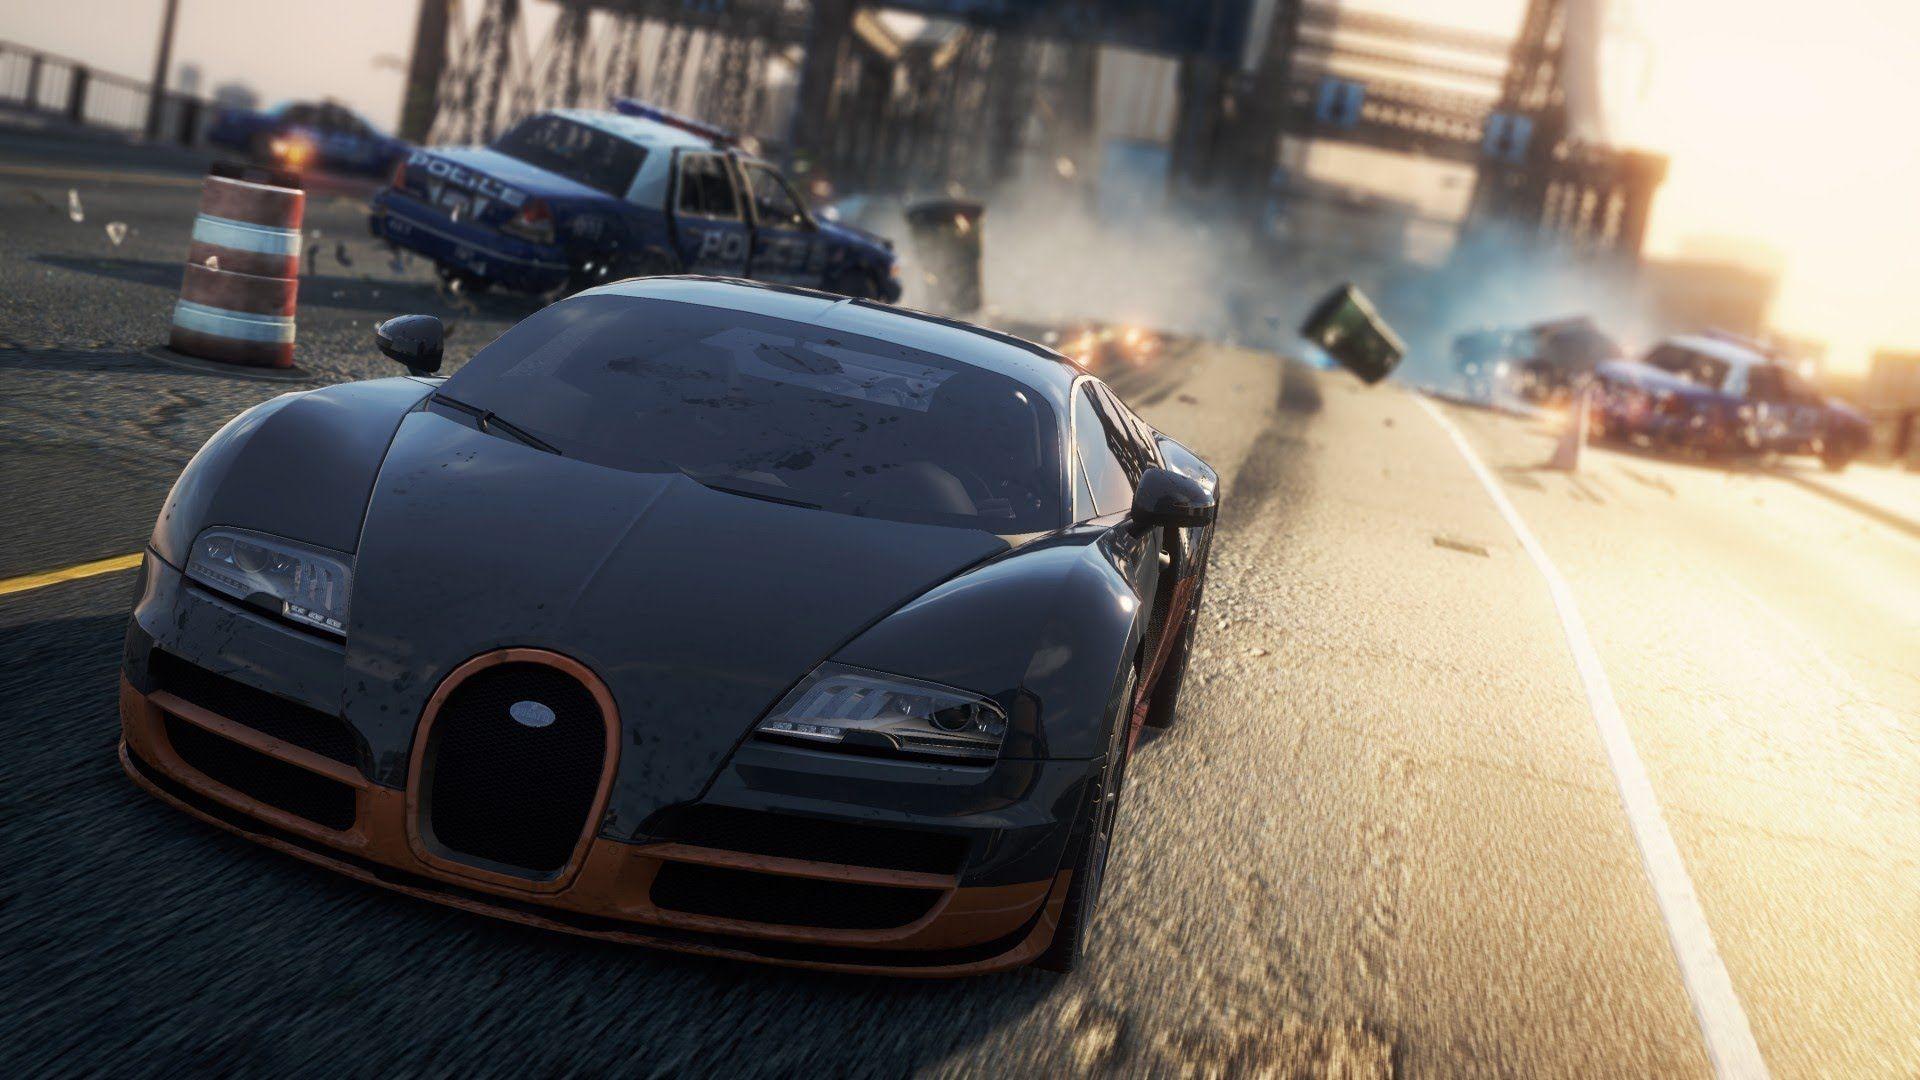 Pin By Felipe Romao Tim Beta Lab On Need For Speed Mostwanted Bugatti Veyron Super Sport Bugatti Veyron Bugatti